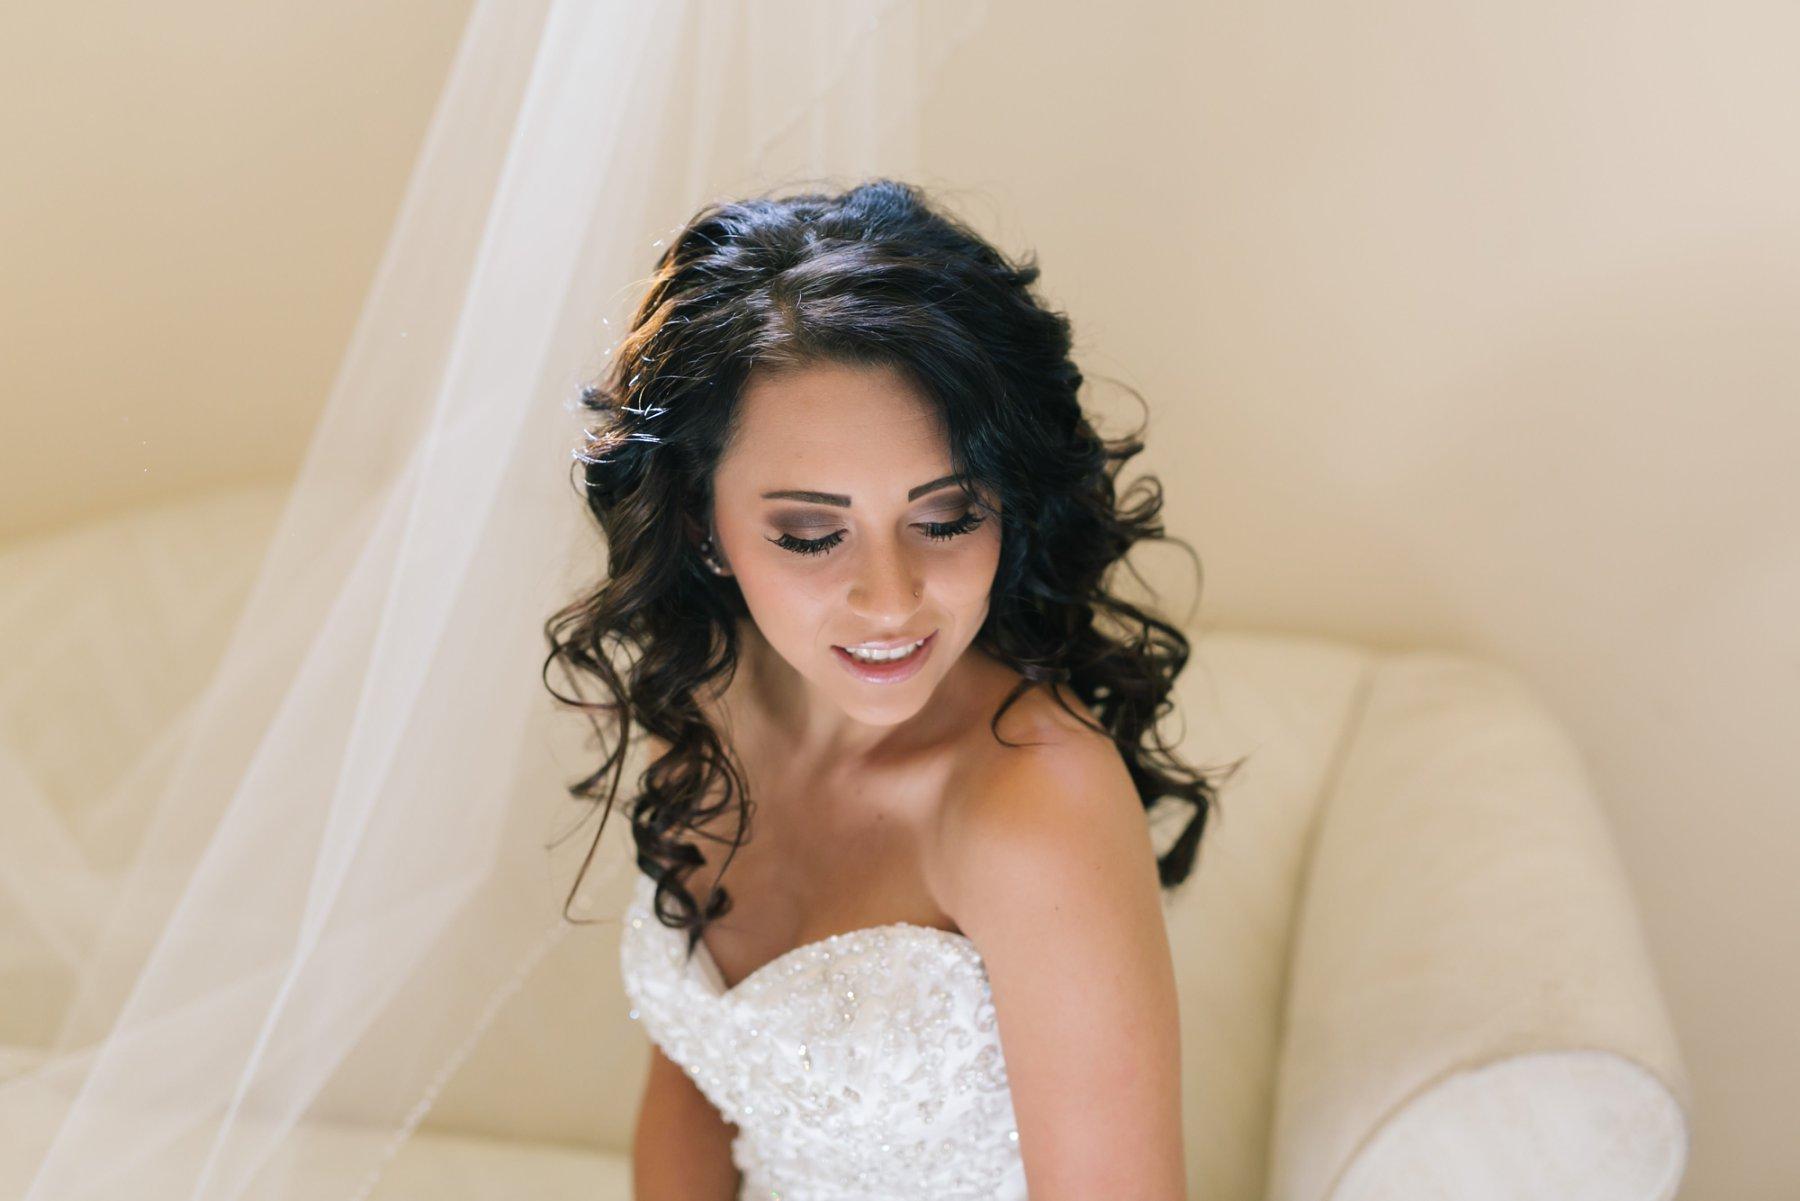 bride on wedding day at Mesa AZ wedding venue Superstition Manor